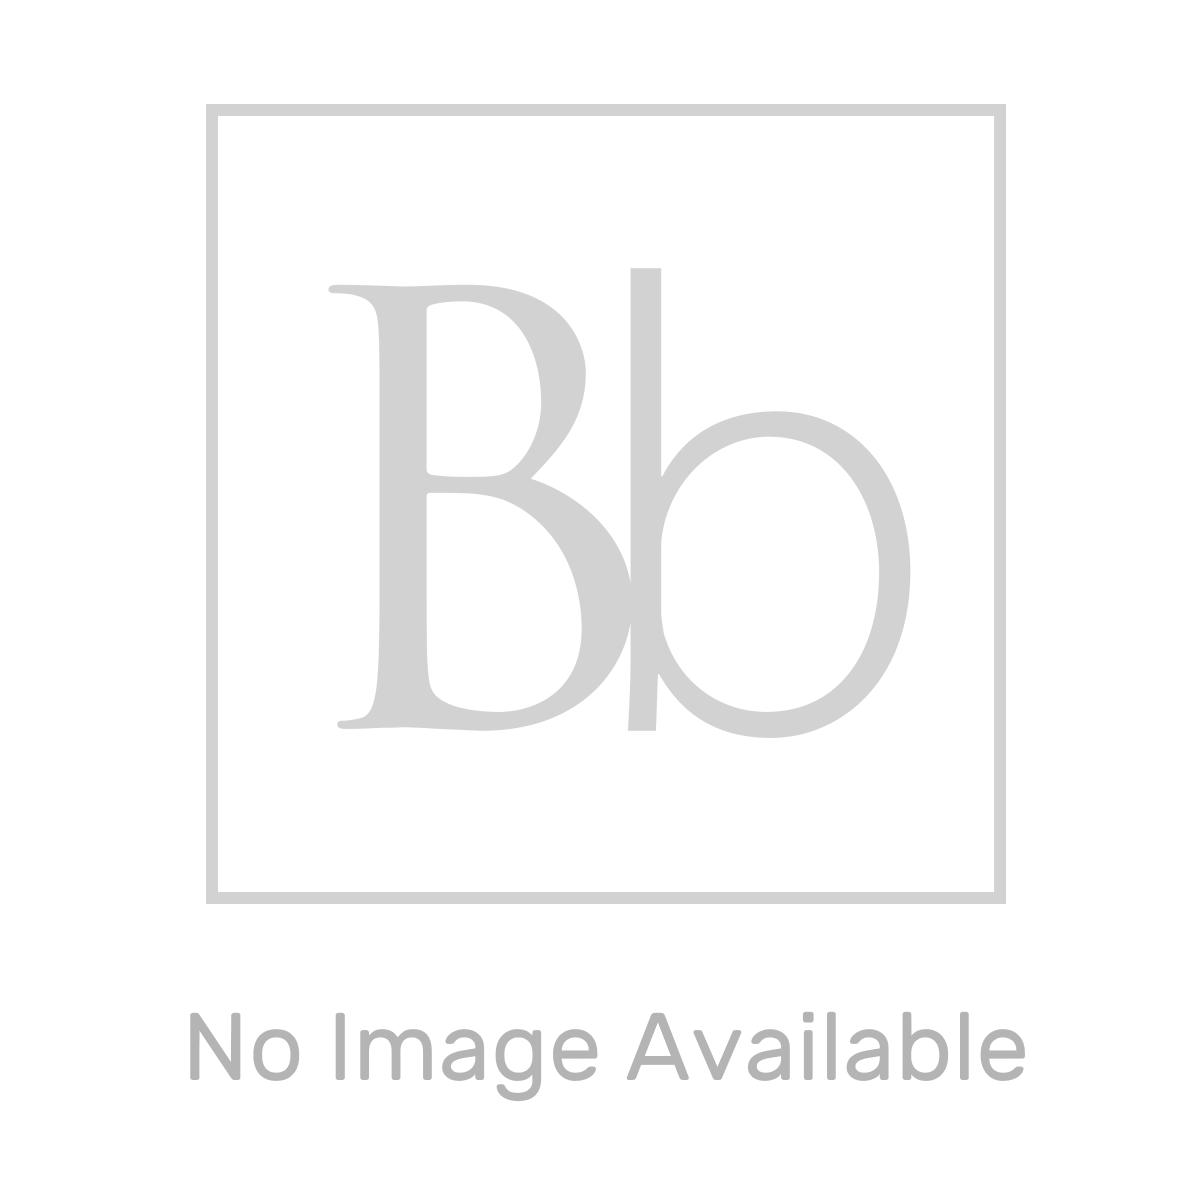 Bali White Ash Floor Standing Vanity Unit 600mm Lifestyle